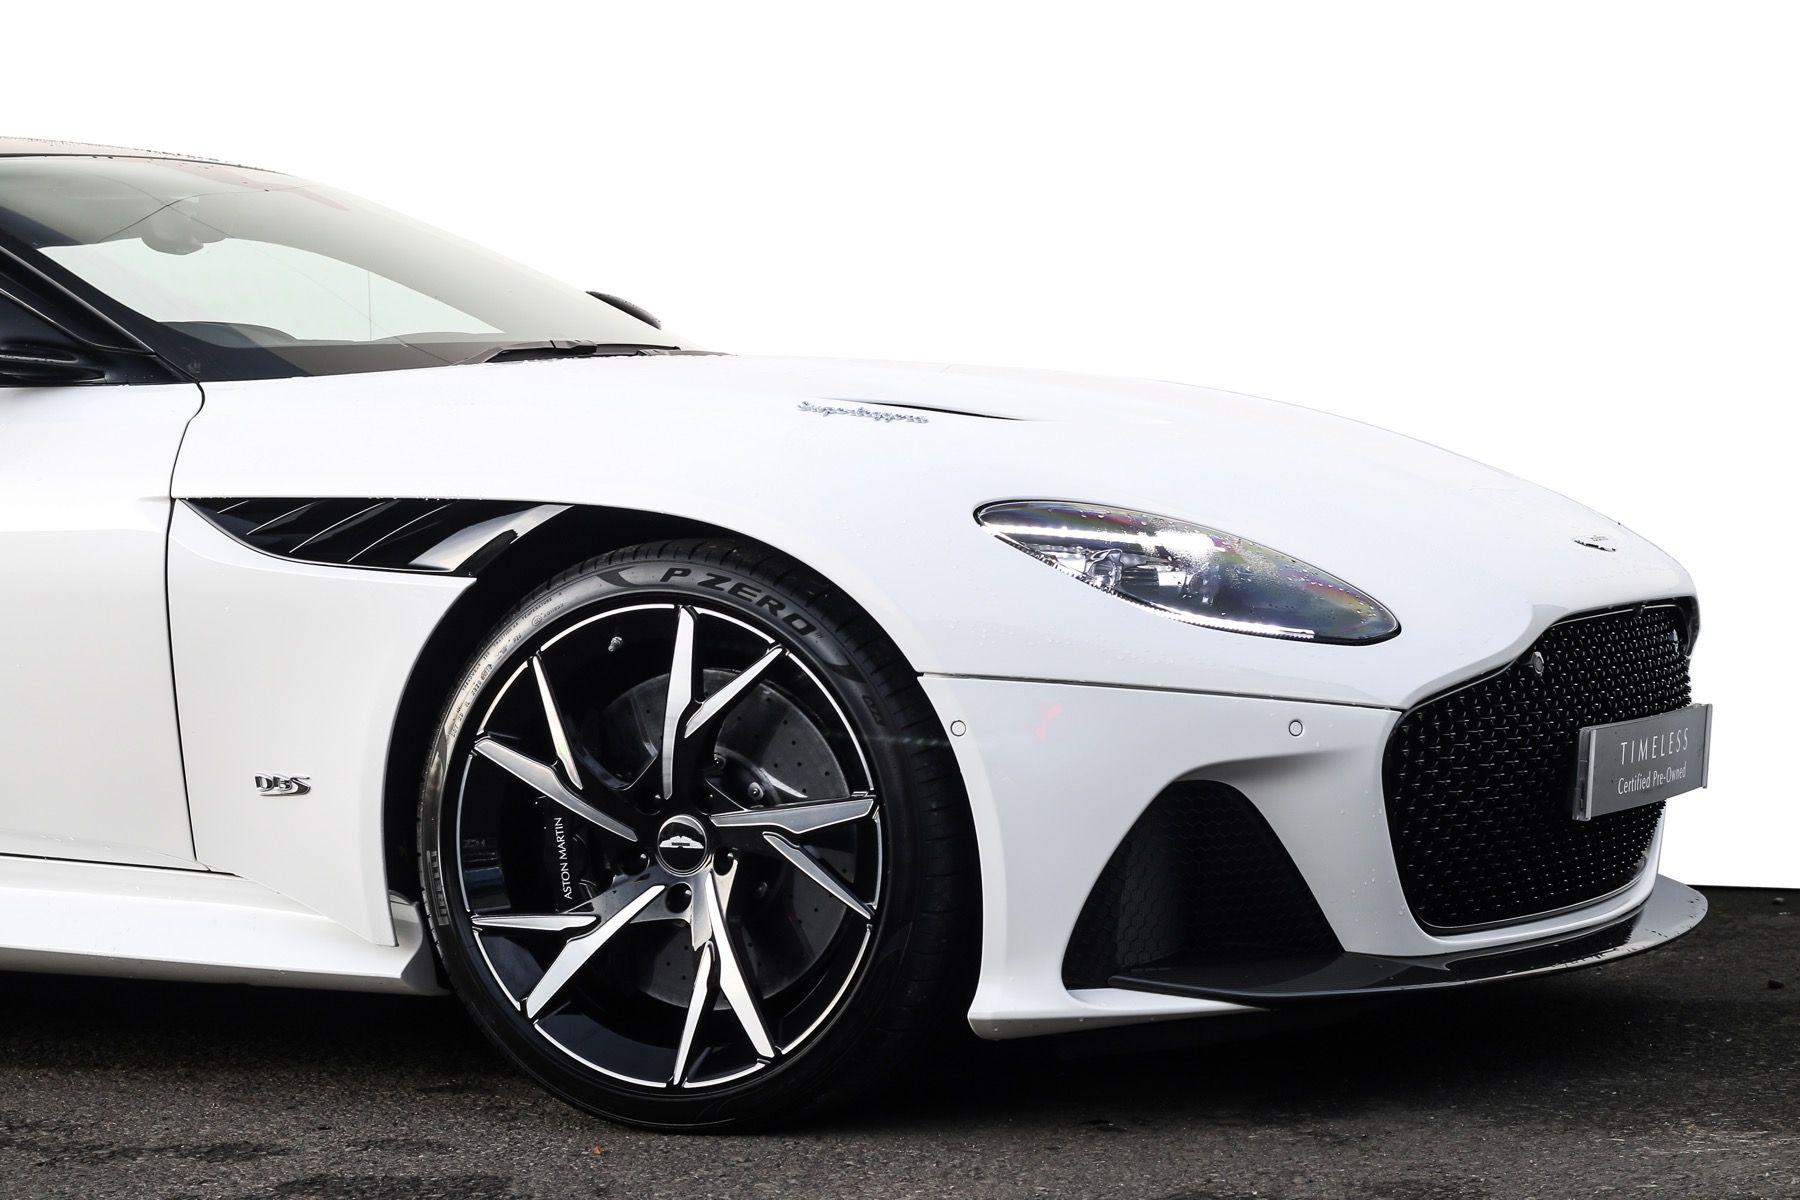 Aston Martin DBS V12 Superleggera 2dr Touchtronic image 10